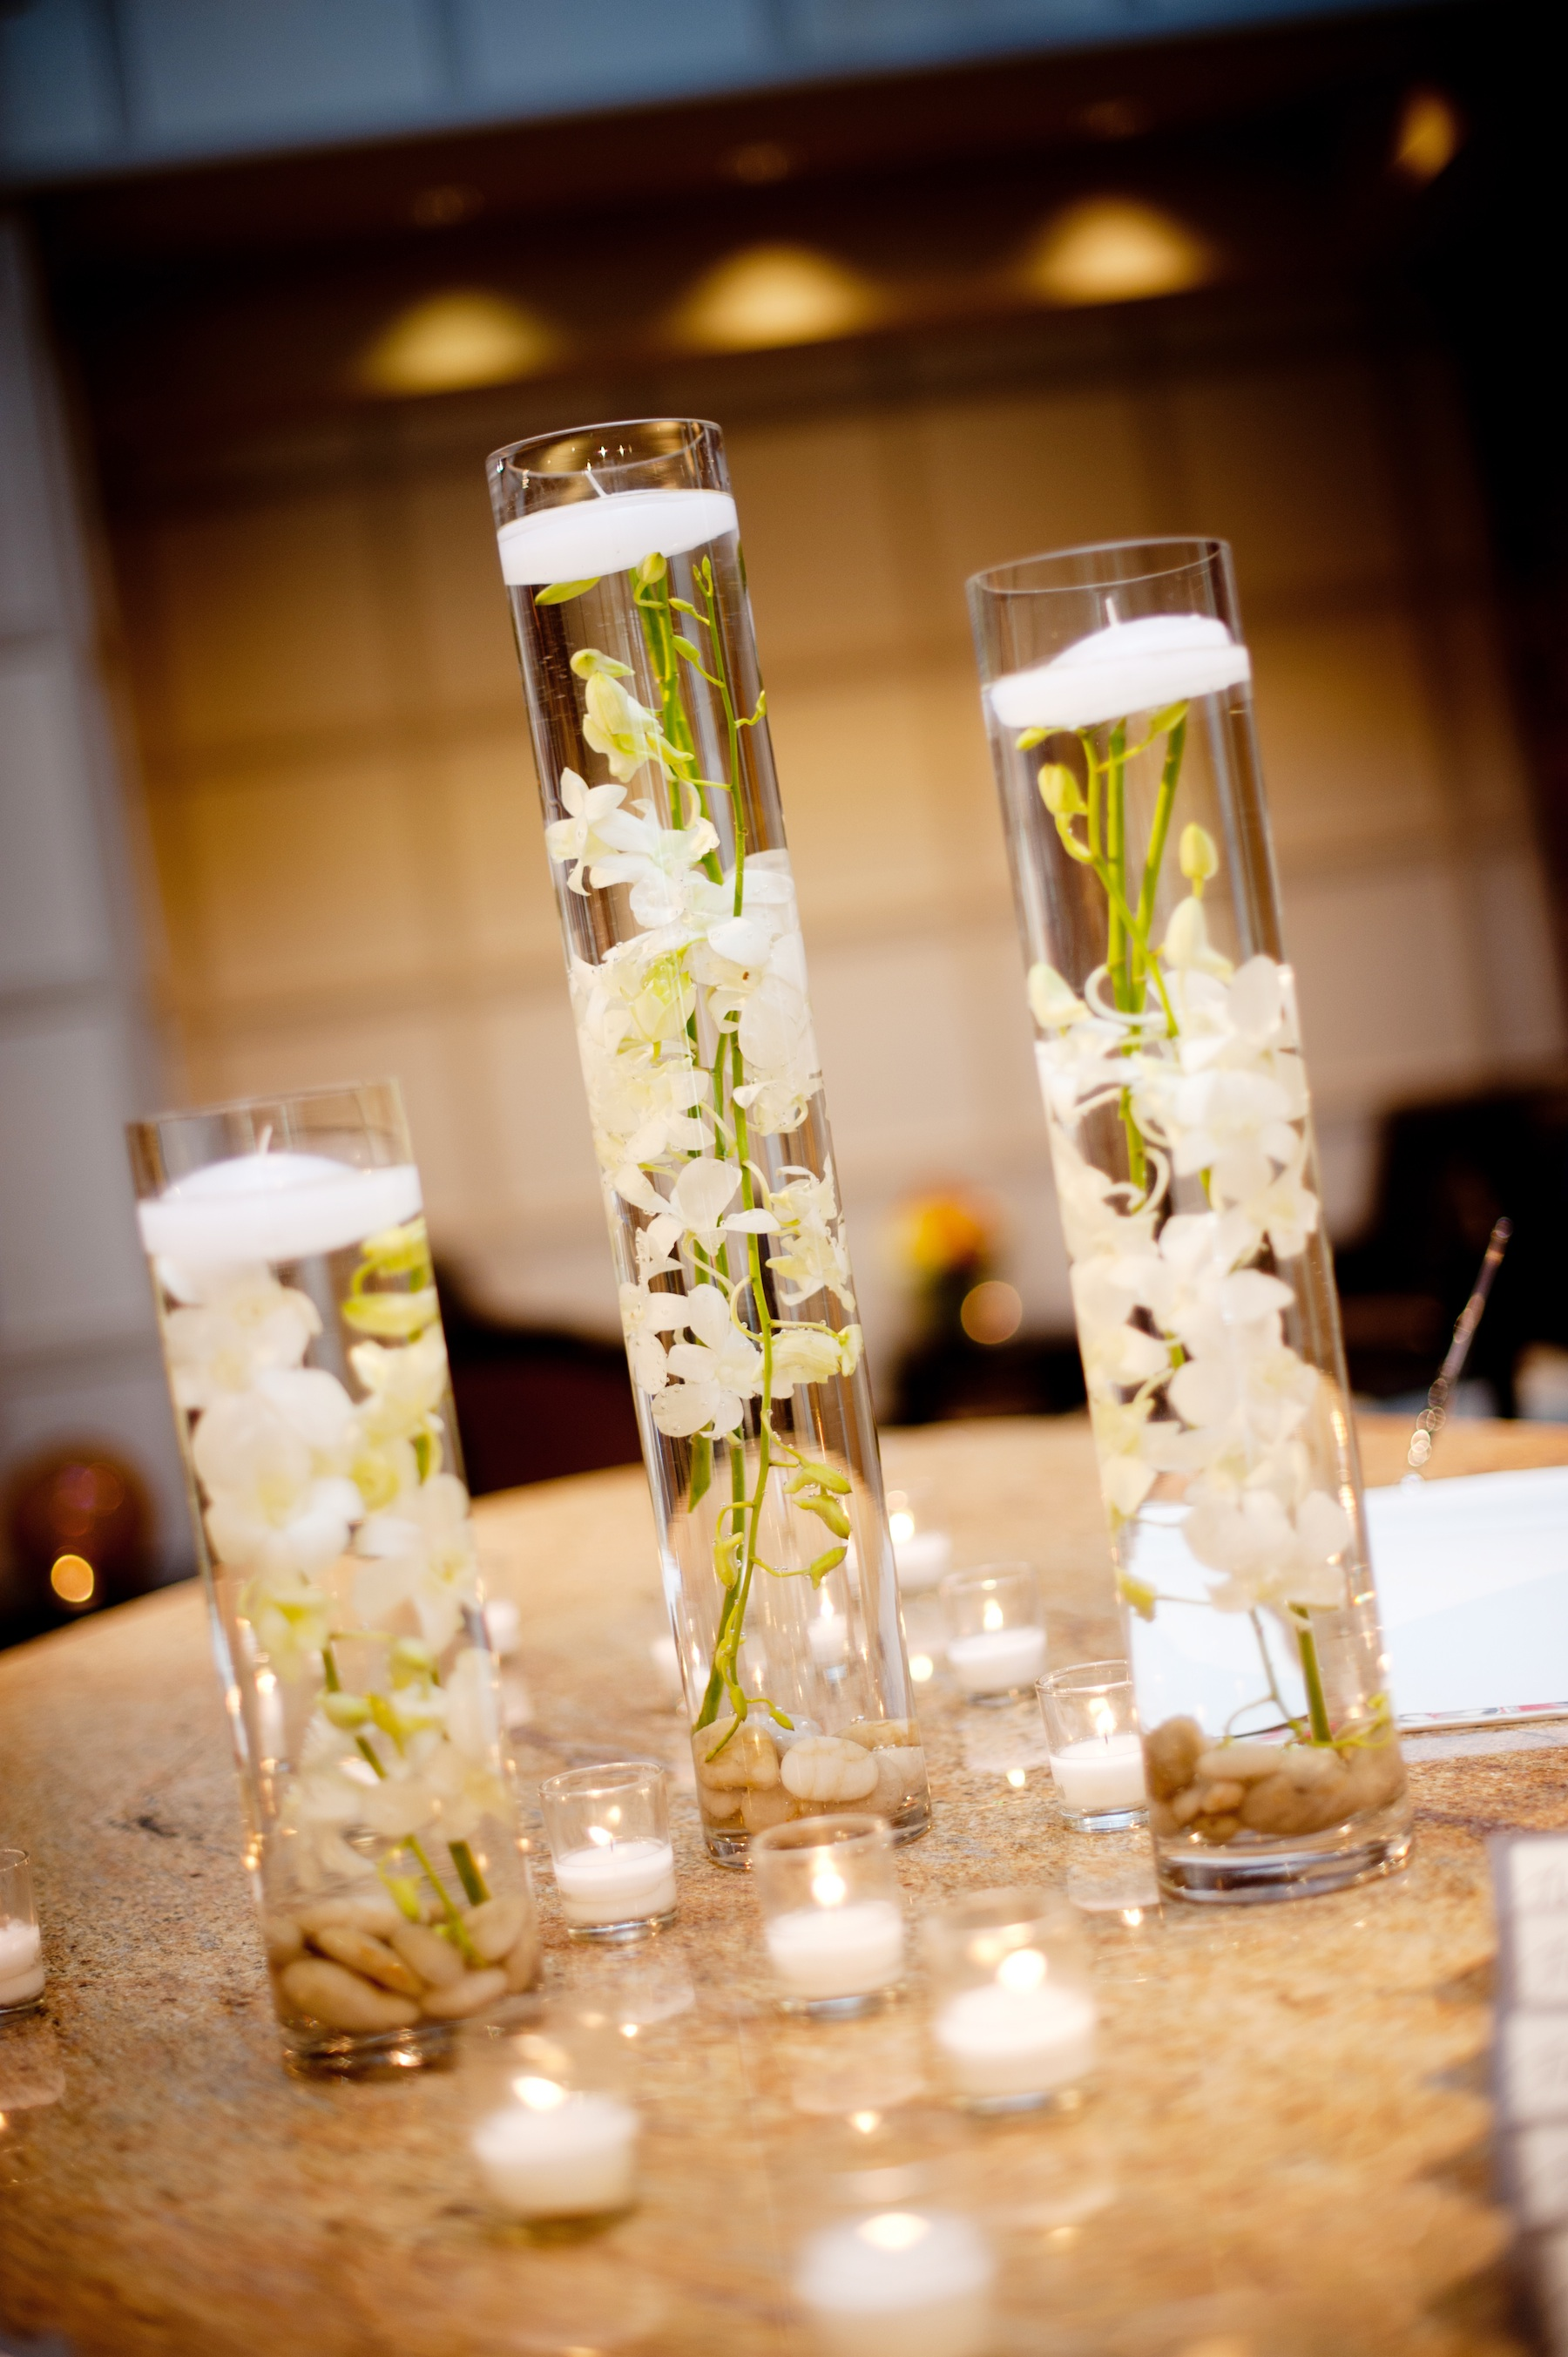 Simple But Elegant Table Decorations Photograph  elegantre